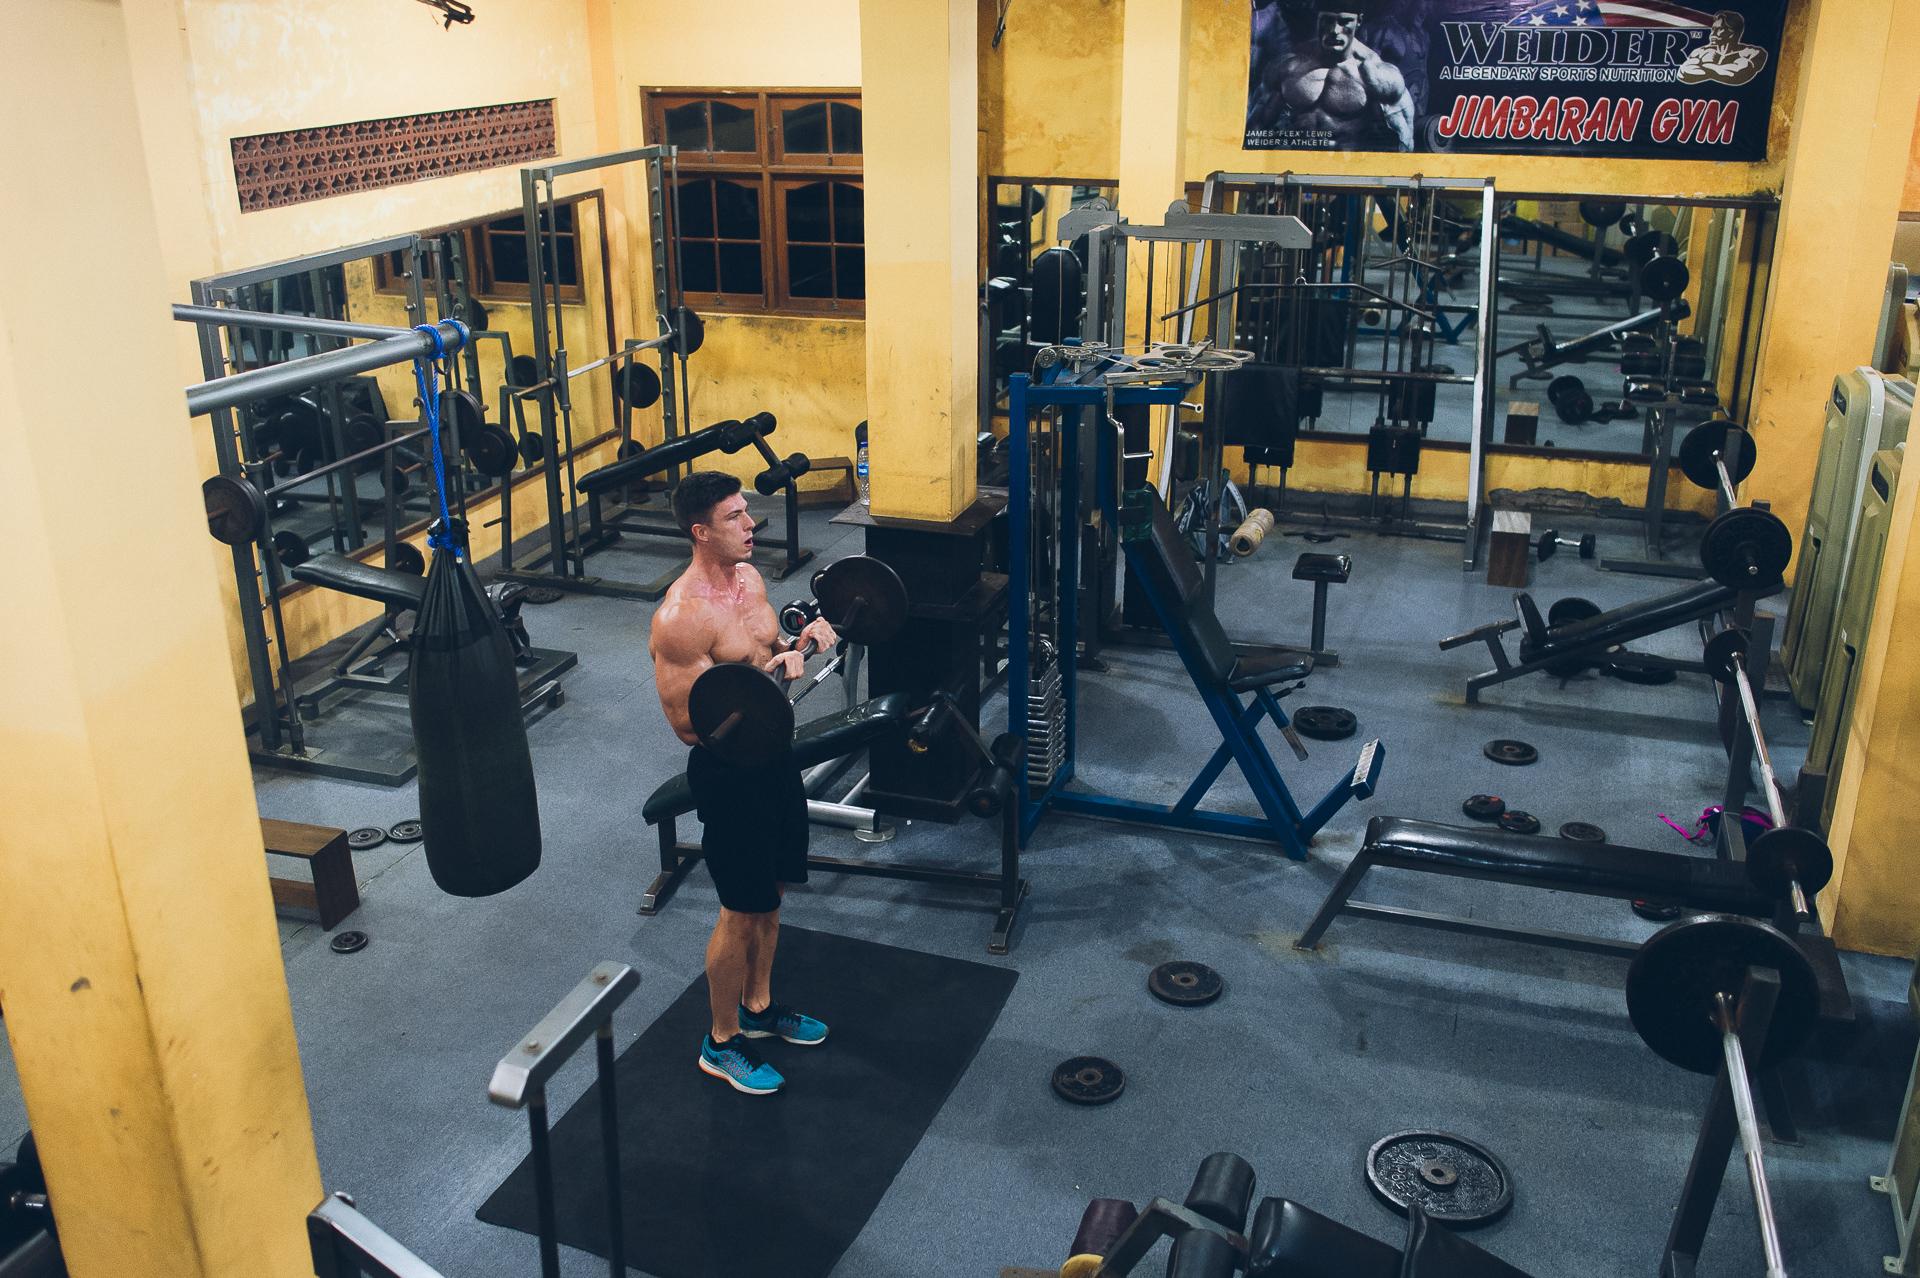 fitnessblog-fitnessblogger-fitness-blog-blogger-stuttgart-dreamteamfitness-gyms-auf-bali-fitness-studios032